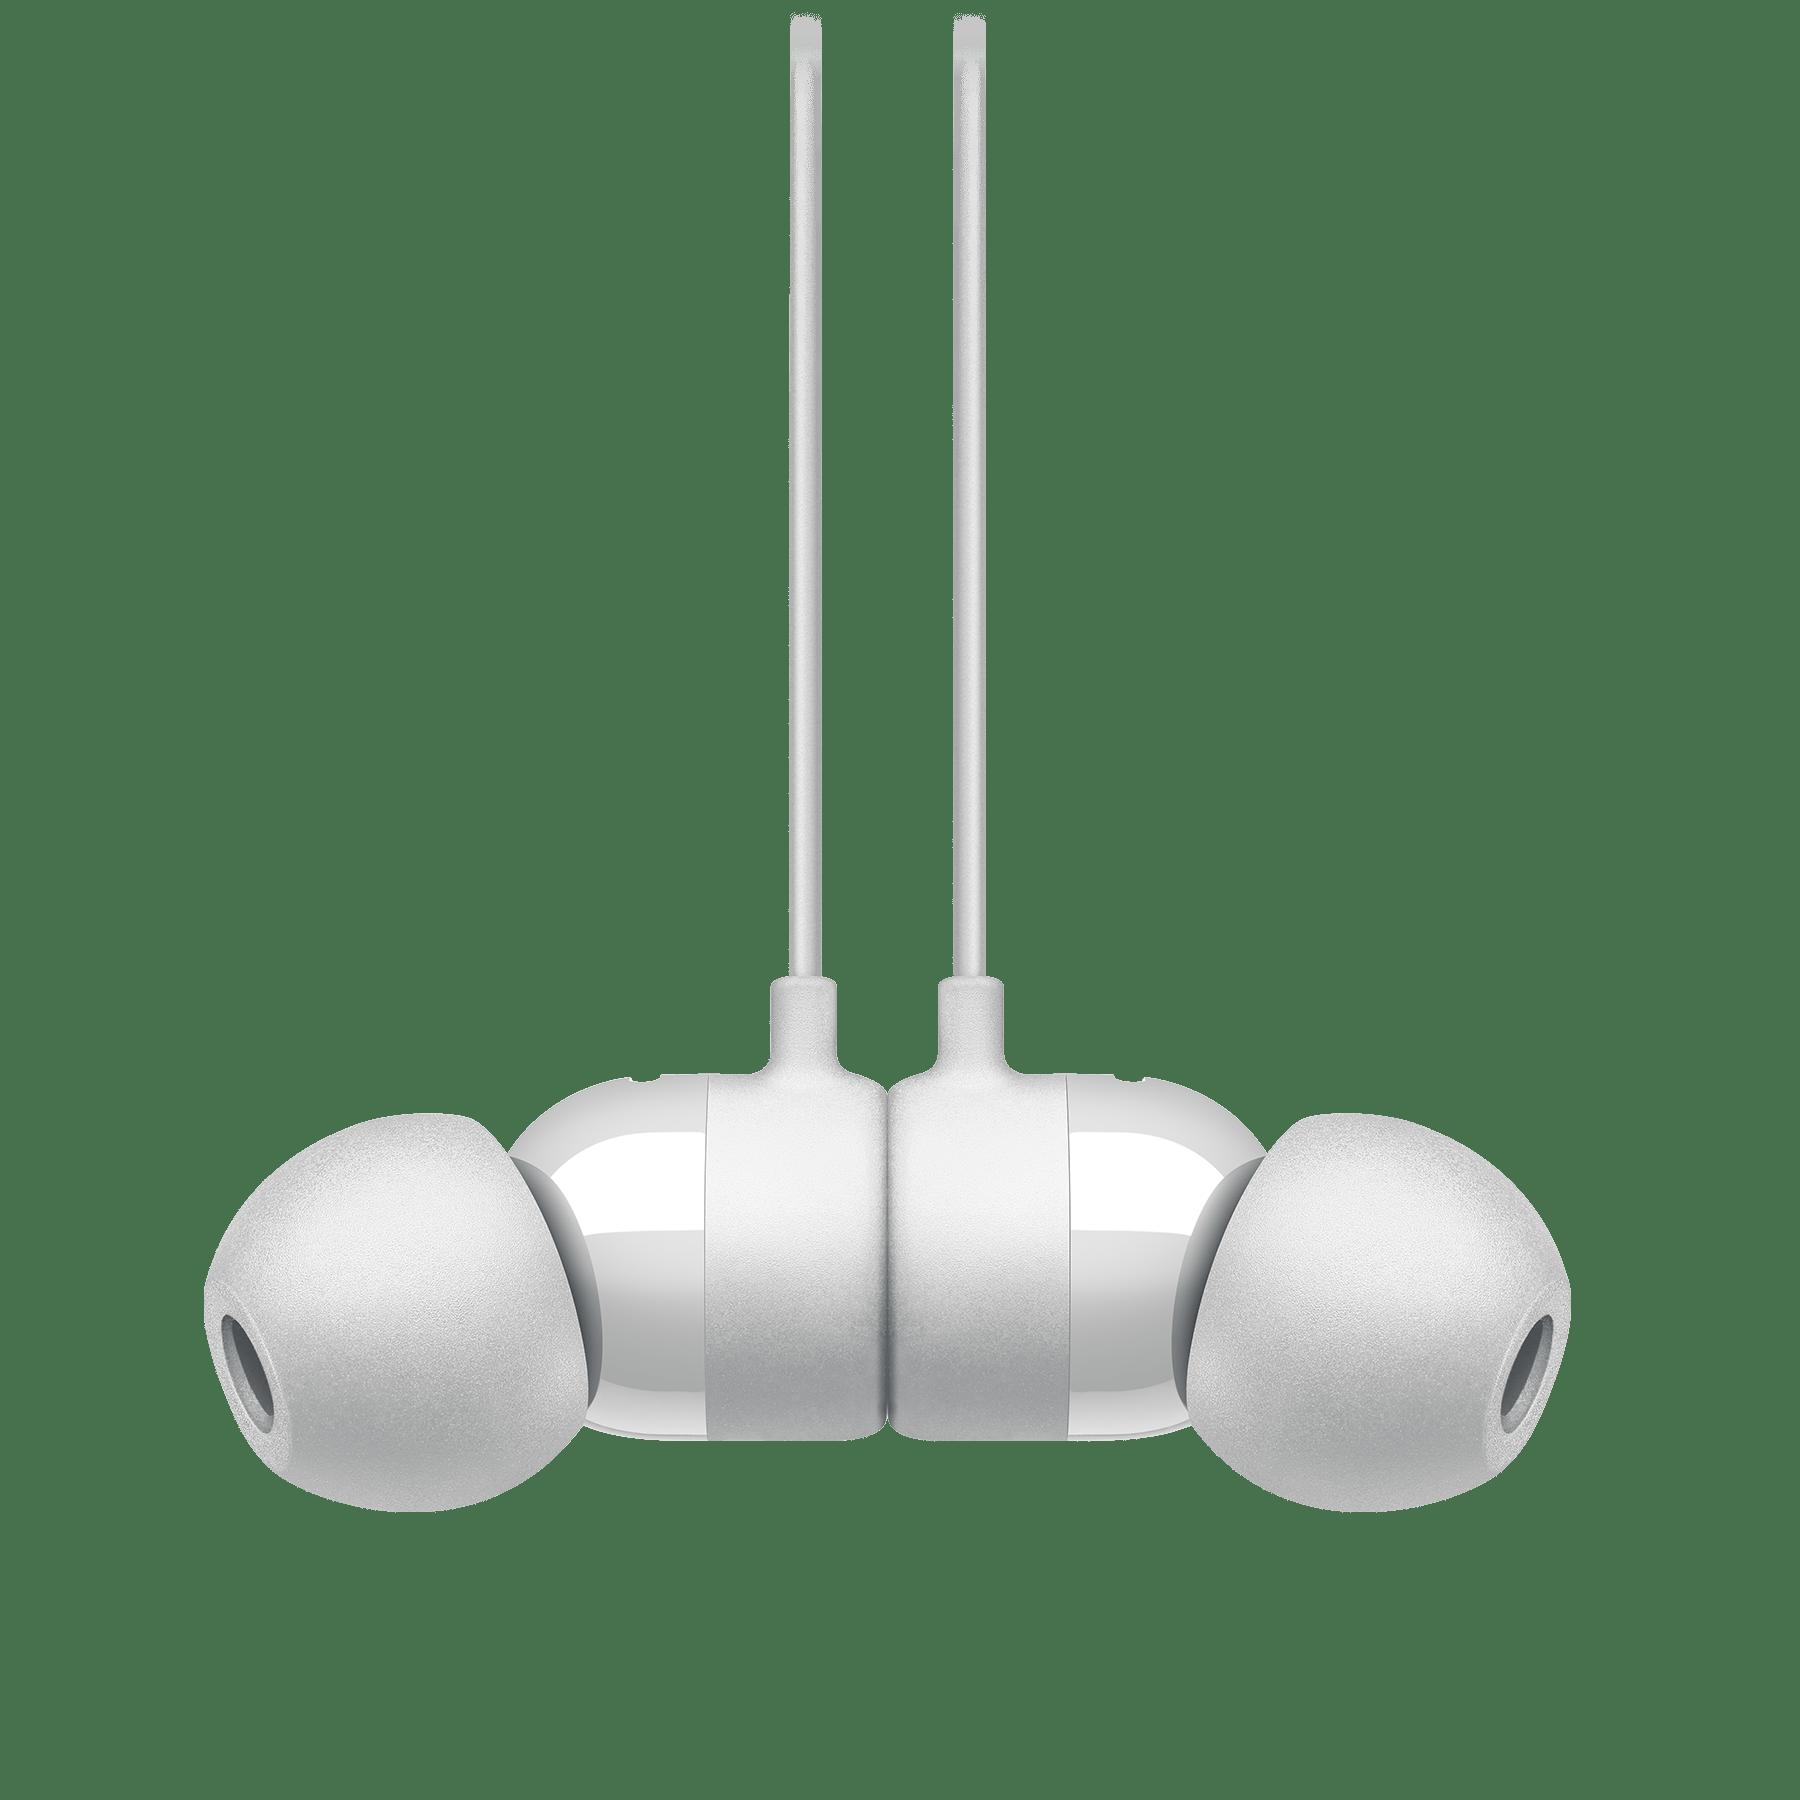 Beatsx Beats By Dre Light Fixture Wiring 2 White Black 1 3 Satin Silver